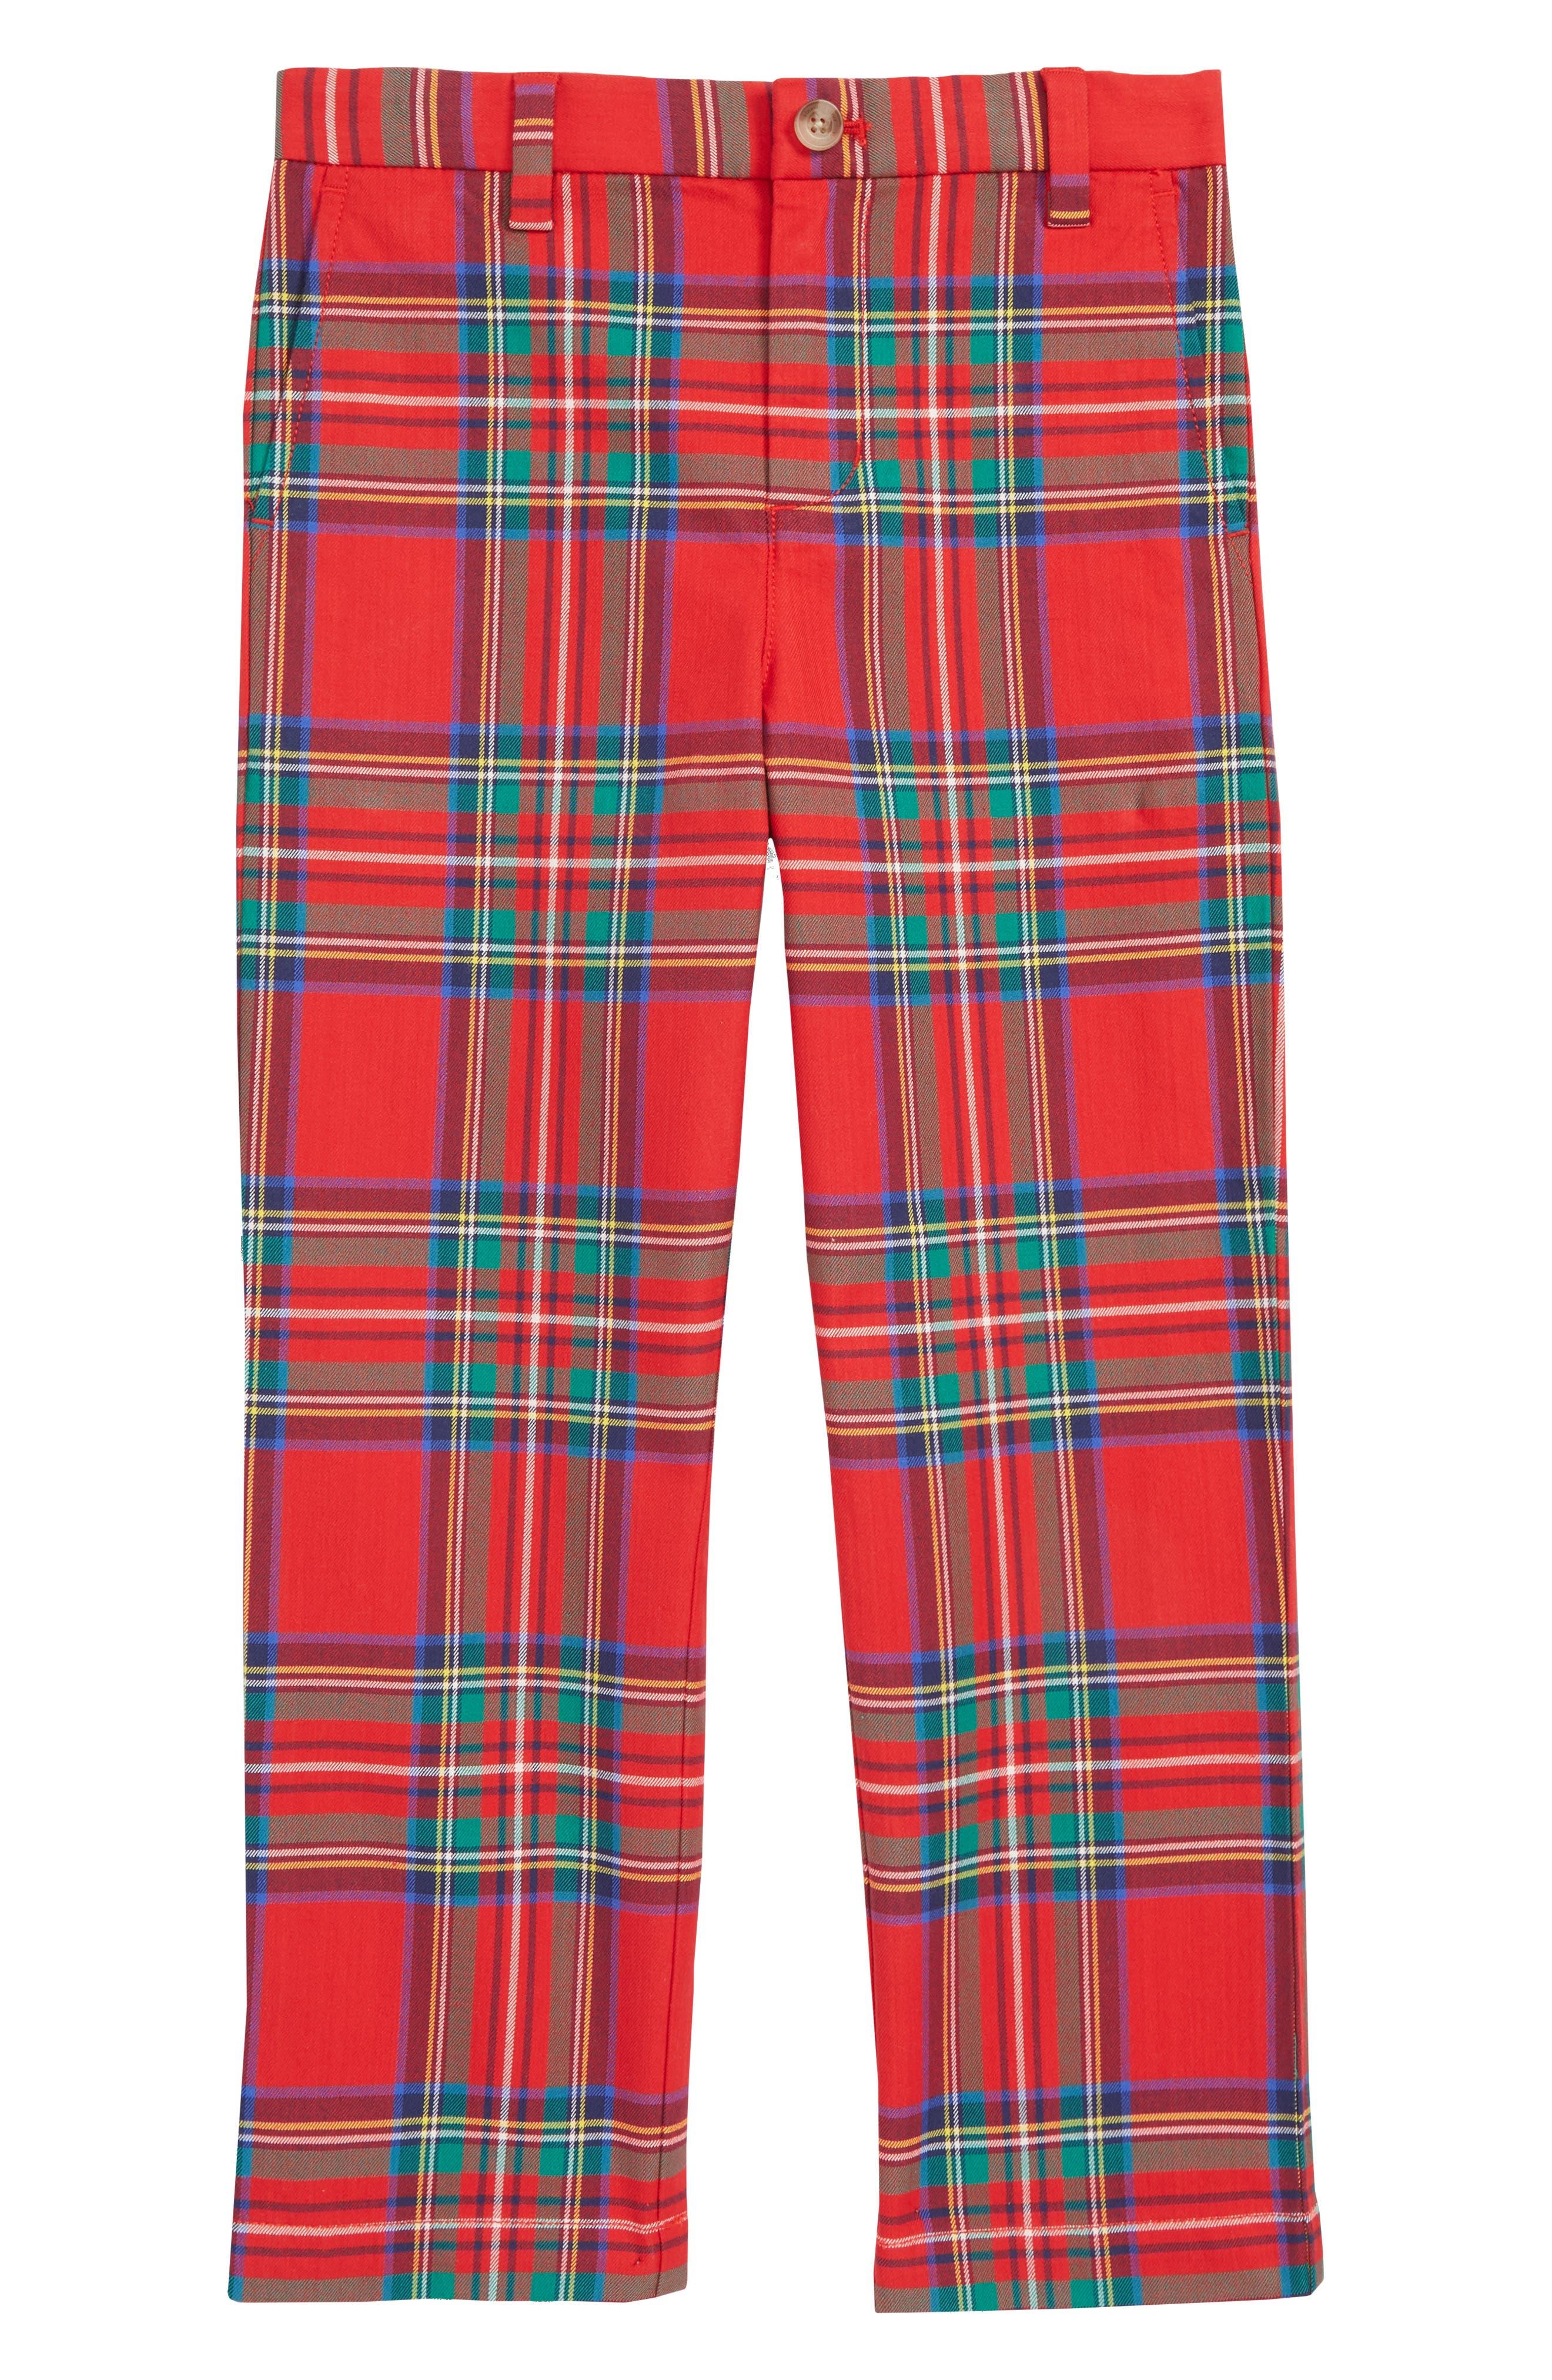 VINEYARD VINES, Jolly Plaid Breaker Pants, Main thumbnail 1, color, 634